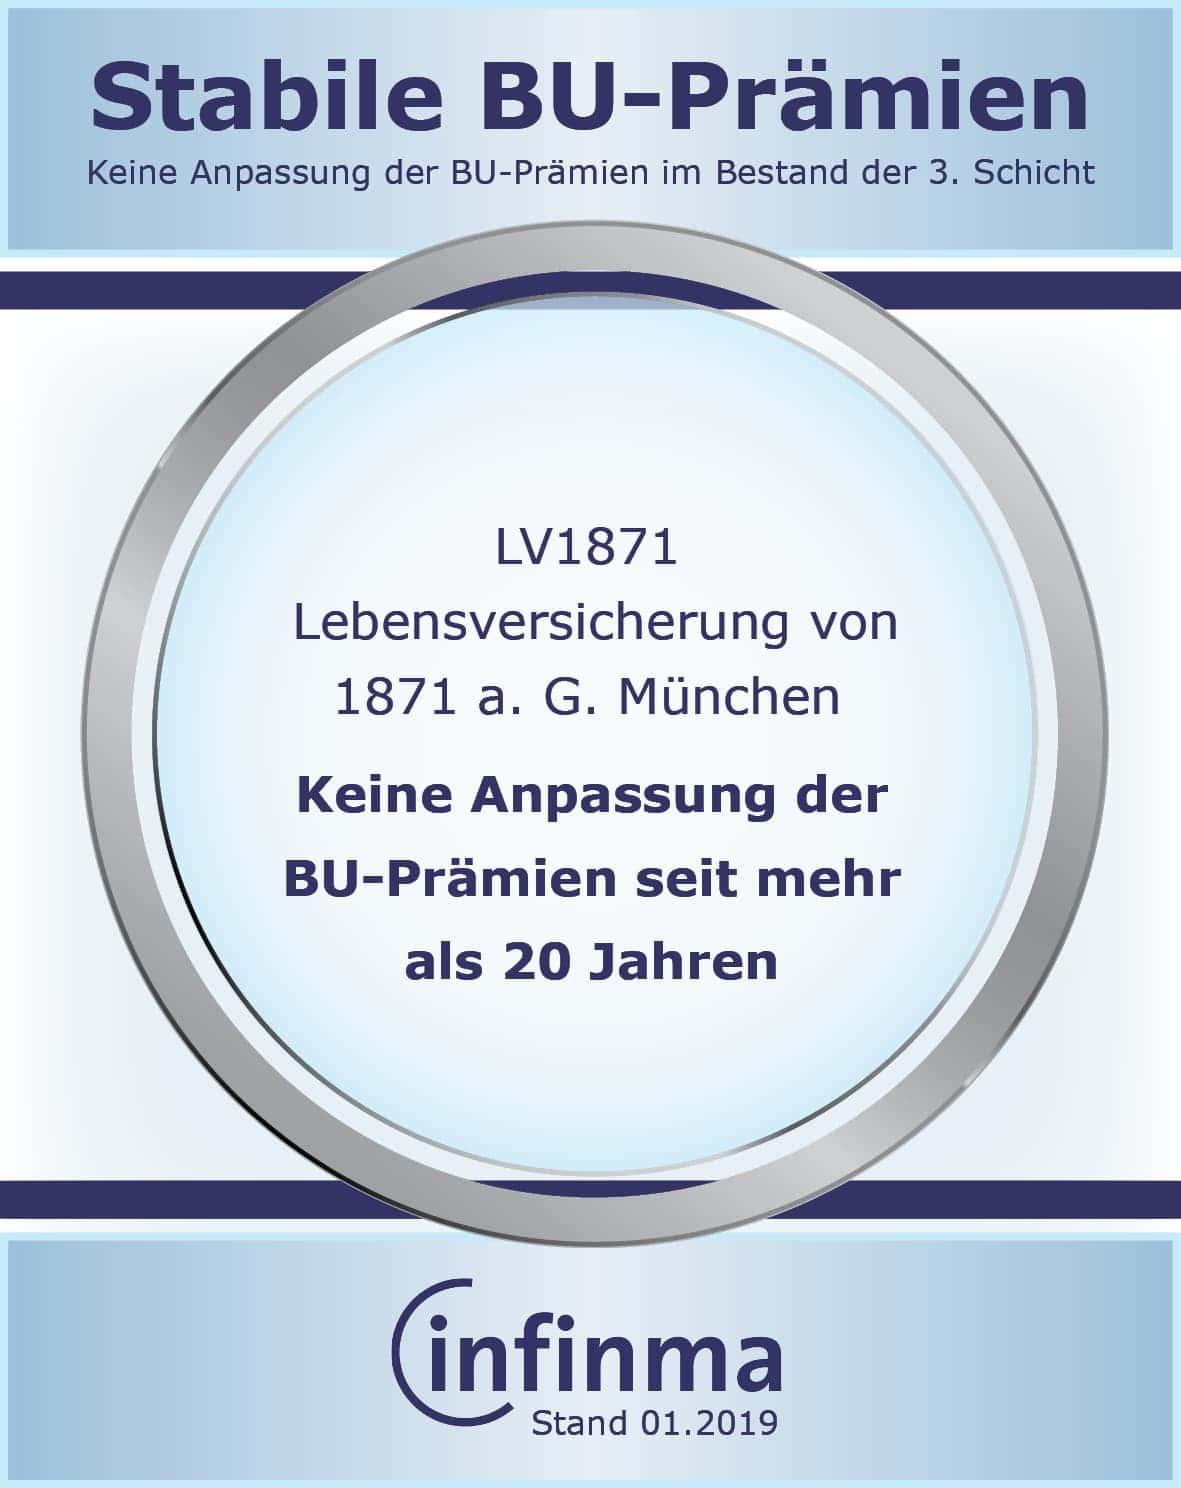 Stabile BU-Prämien Infinma Siegel